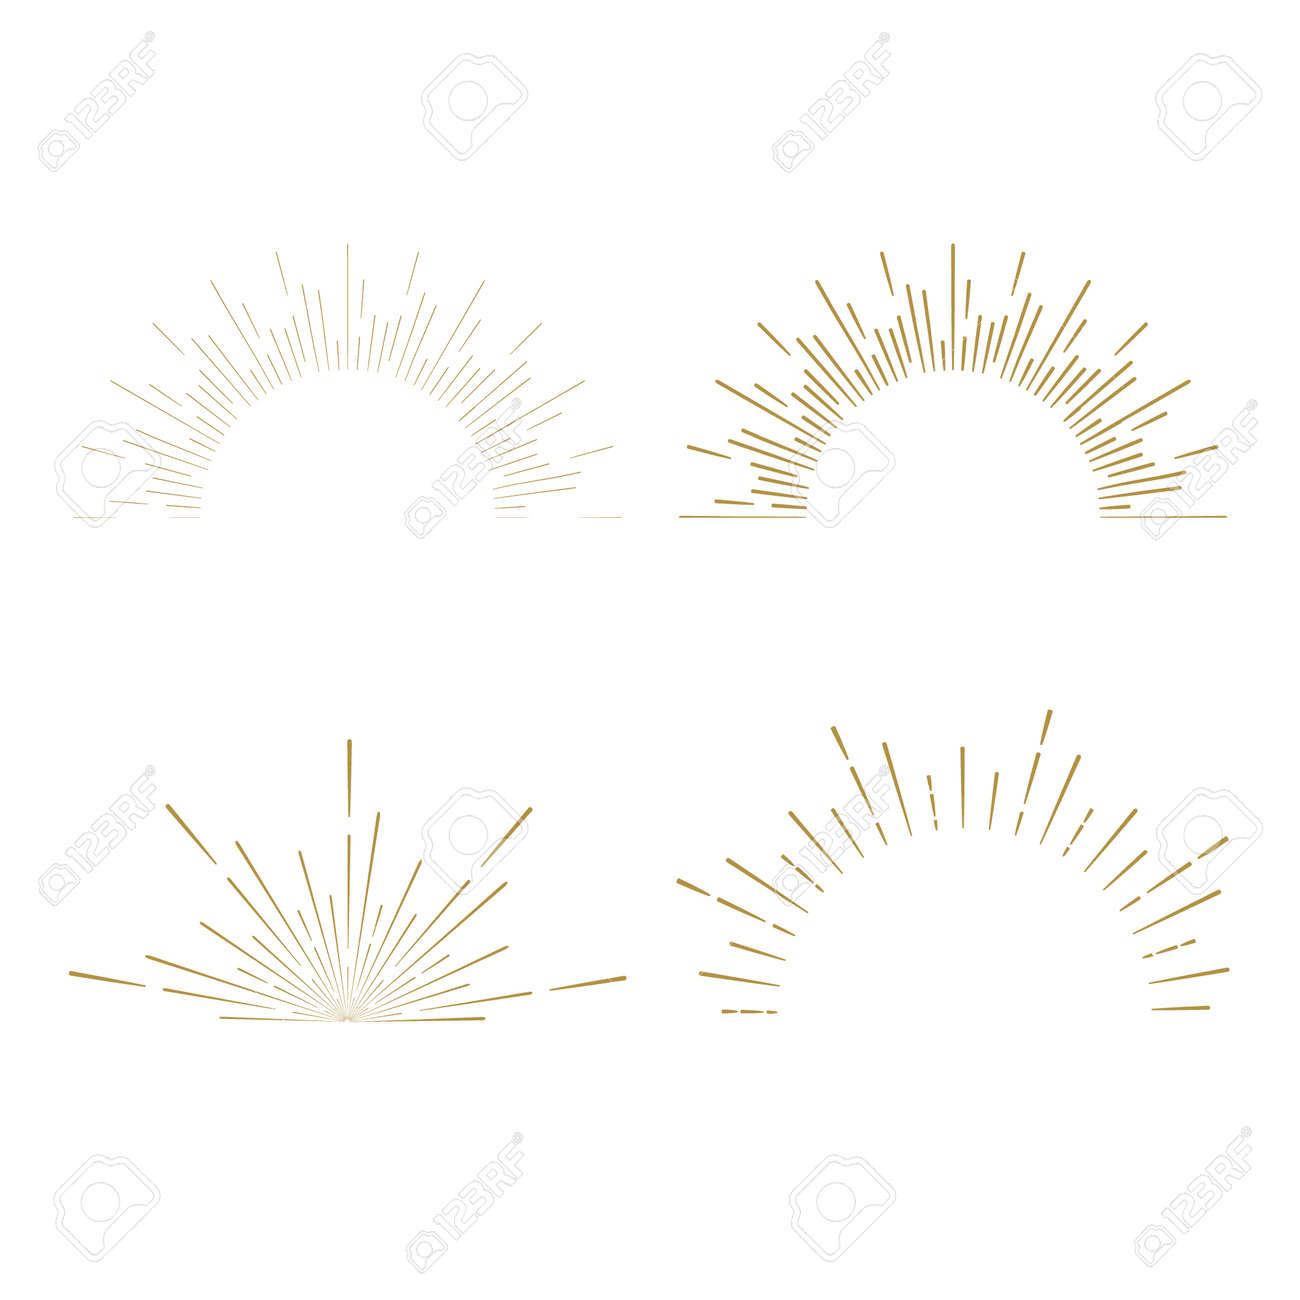 Retro Sun burst shapes. Vintage starburst logo, labels, badges. Sunburst minimal logo frames. Vector firework design elements isolated. Sun burst light logo. Minimal vintage gold firework burst icon - 55017721